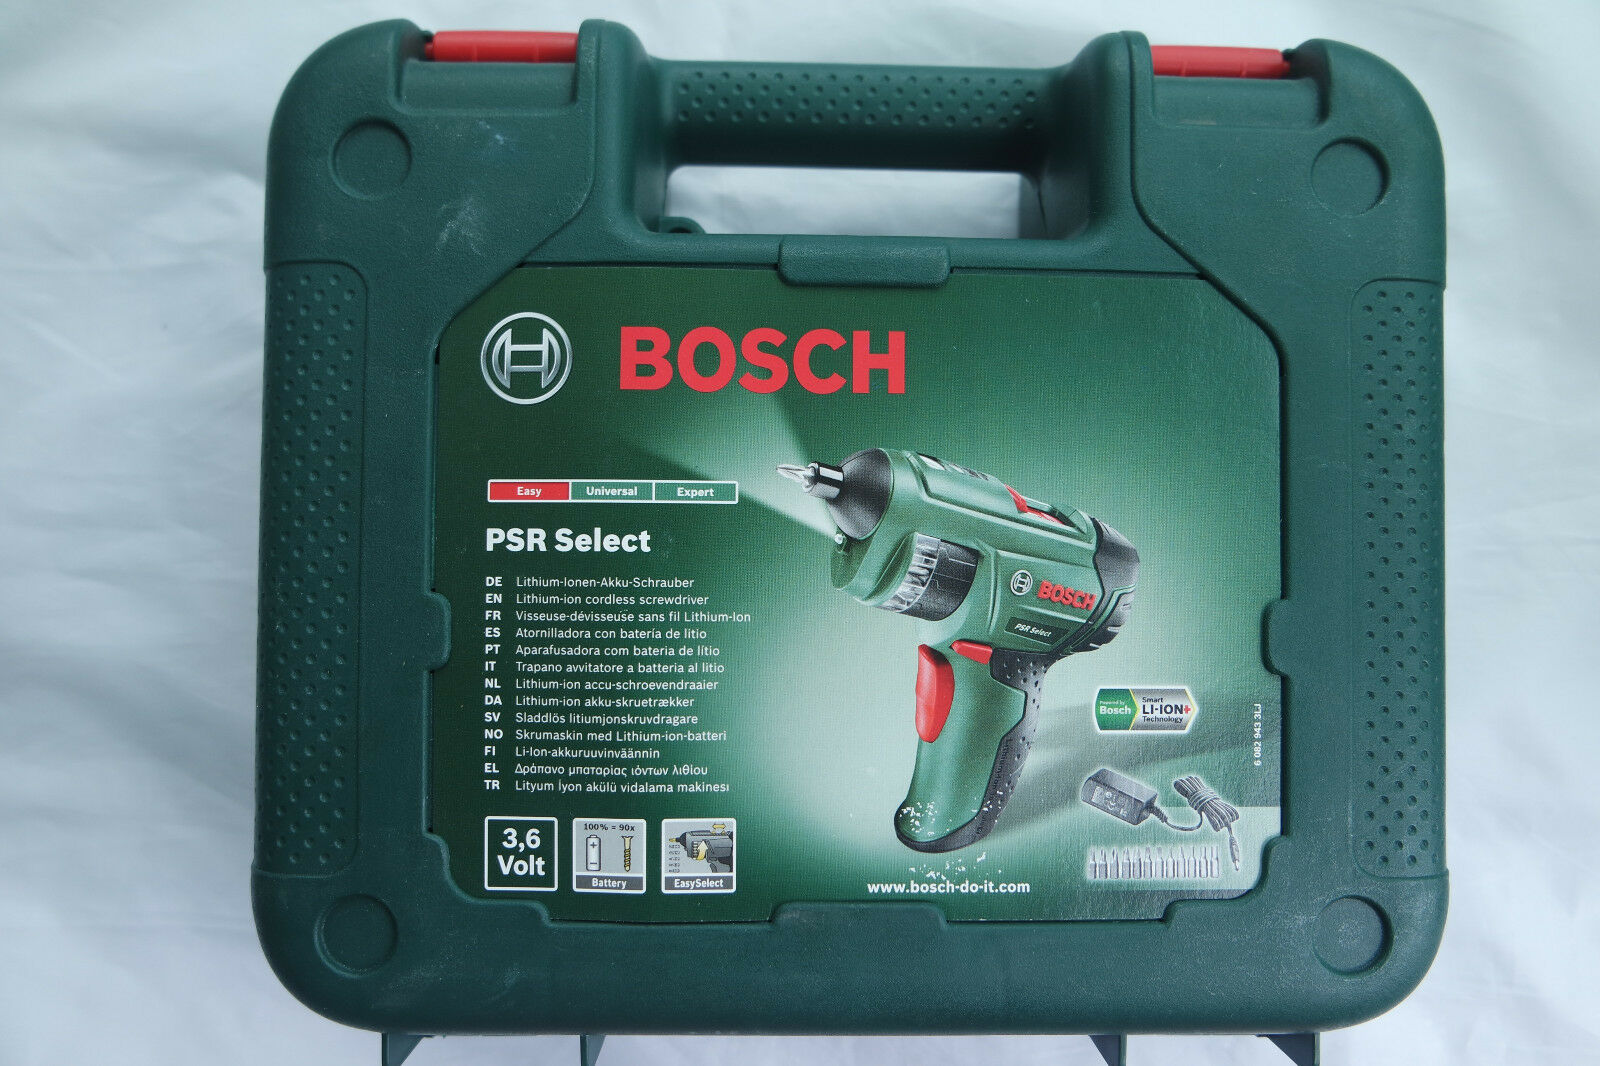 Bosch Akku-Schrauber Lithium-Ionen PSR Select 3,6V